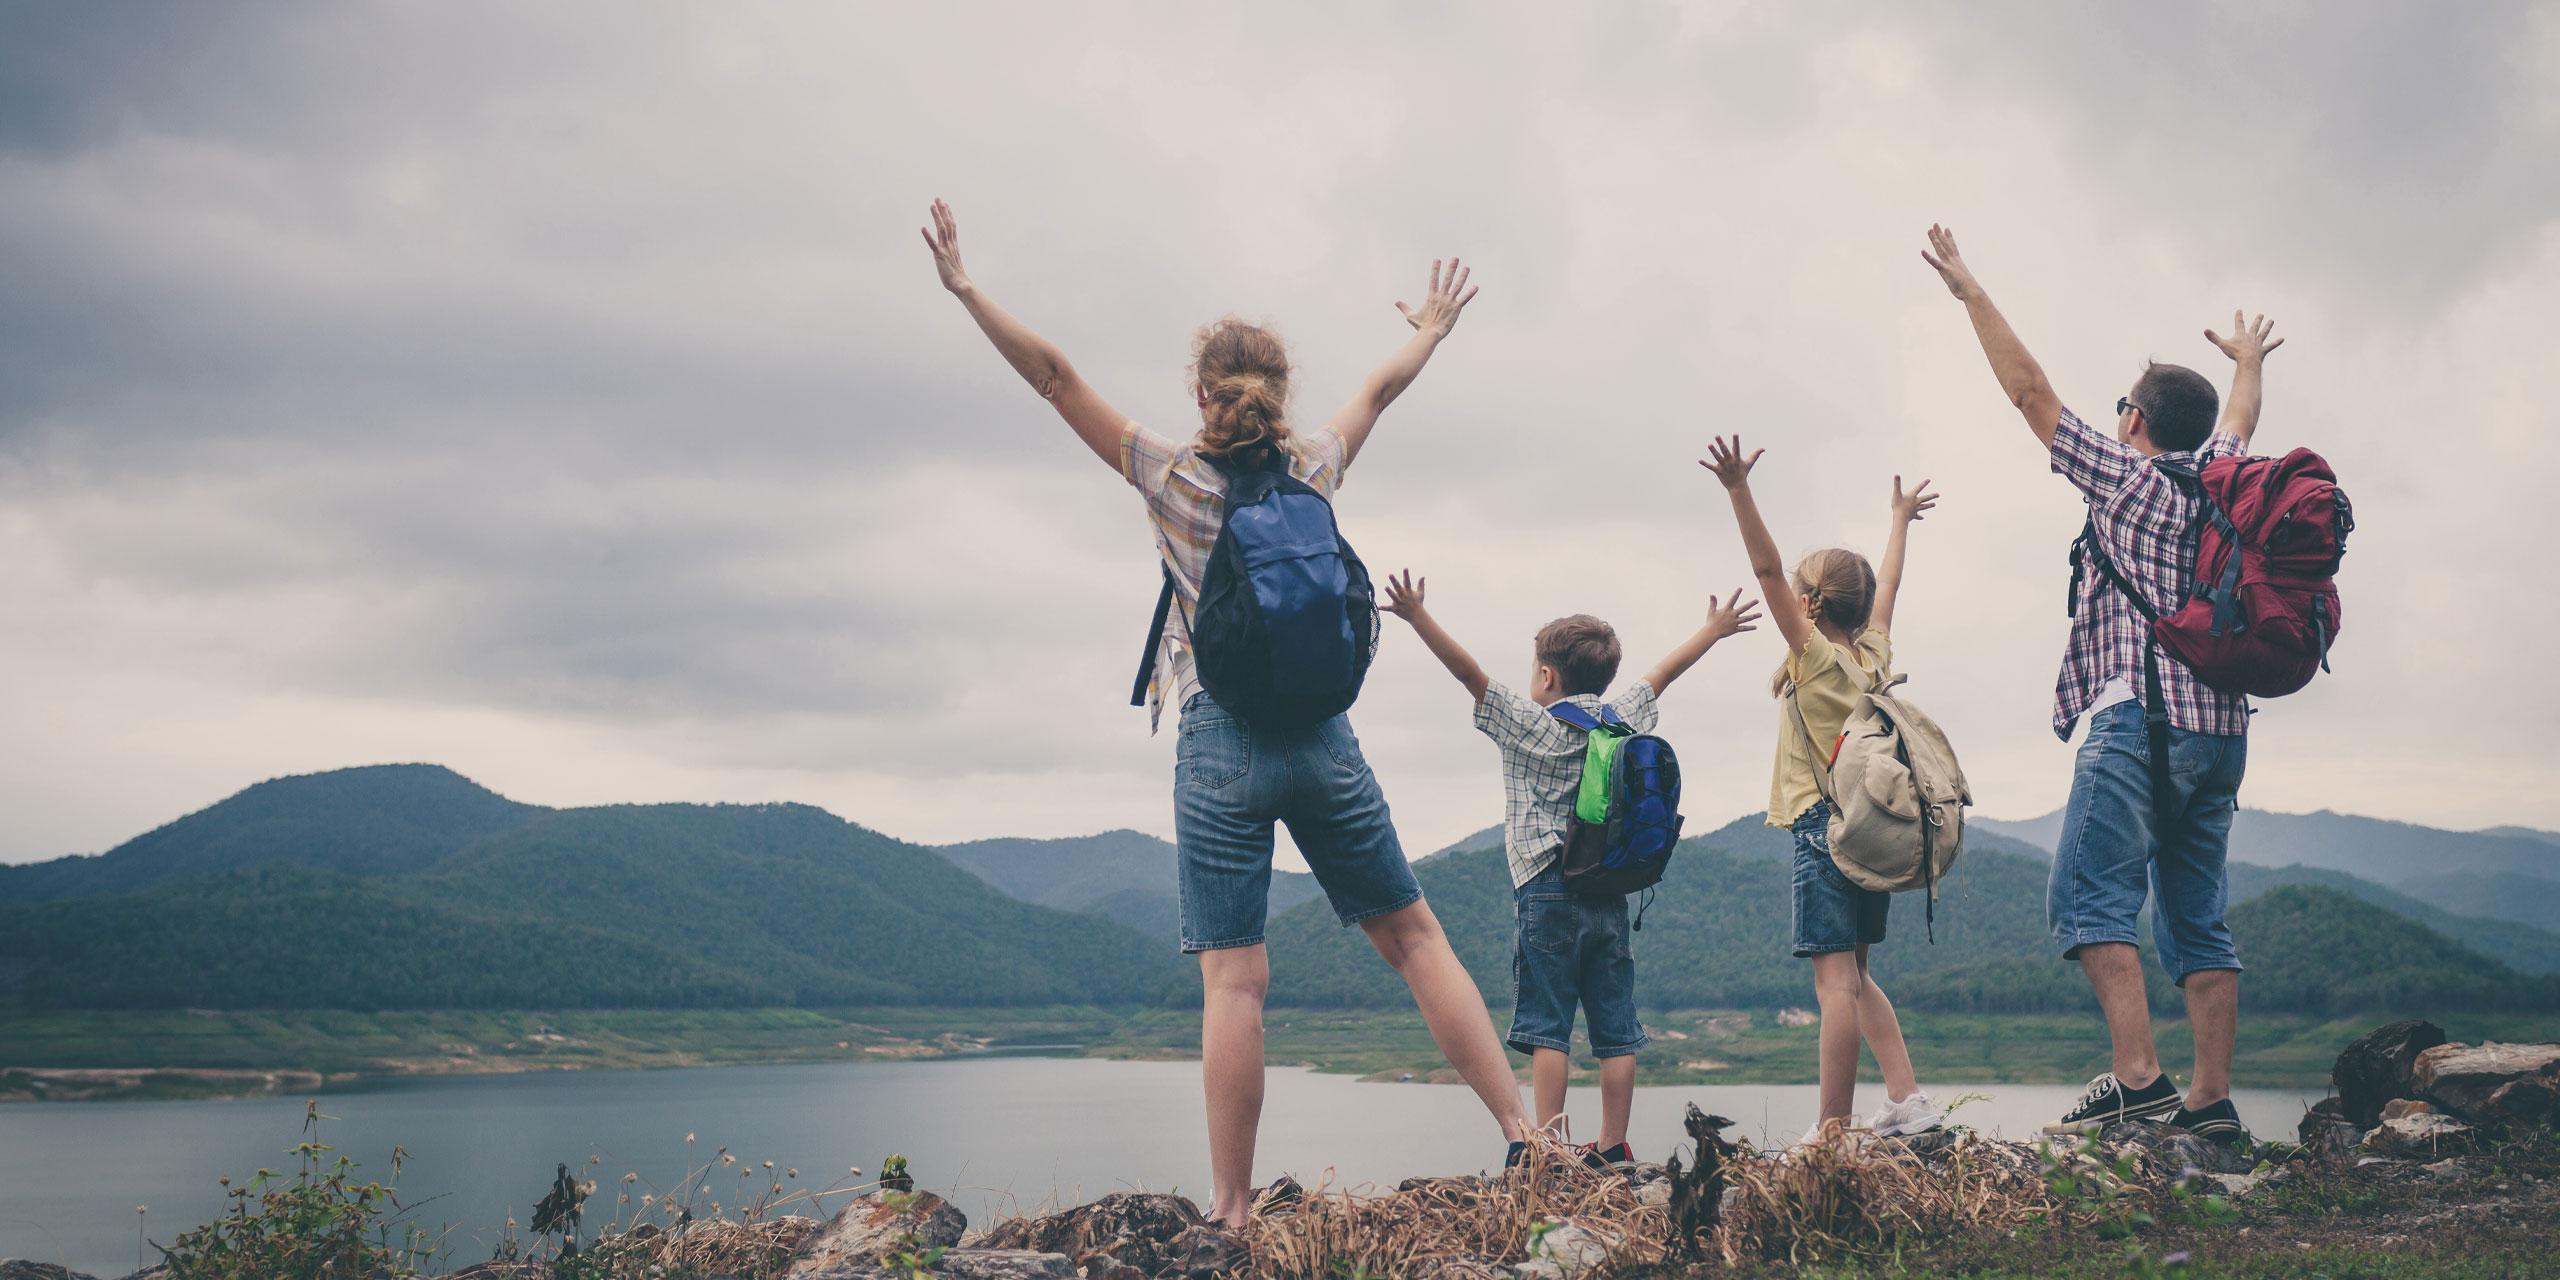 Family hiking with backpacks; Courtesy of altanaka/Shutterstock.com